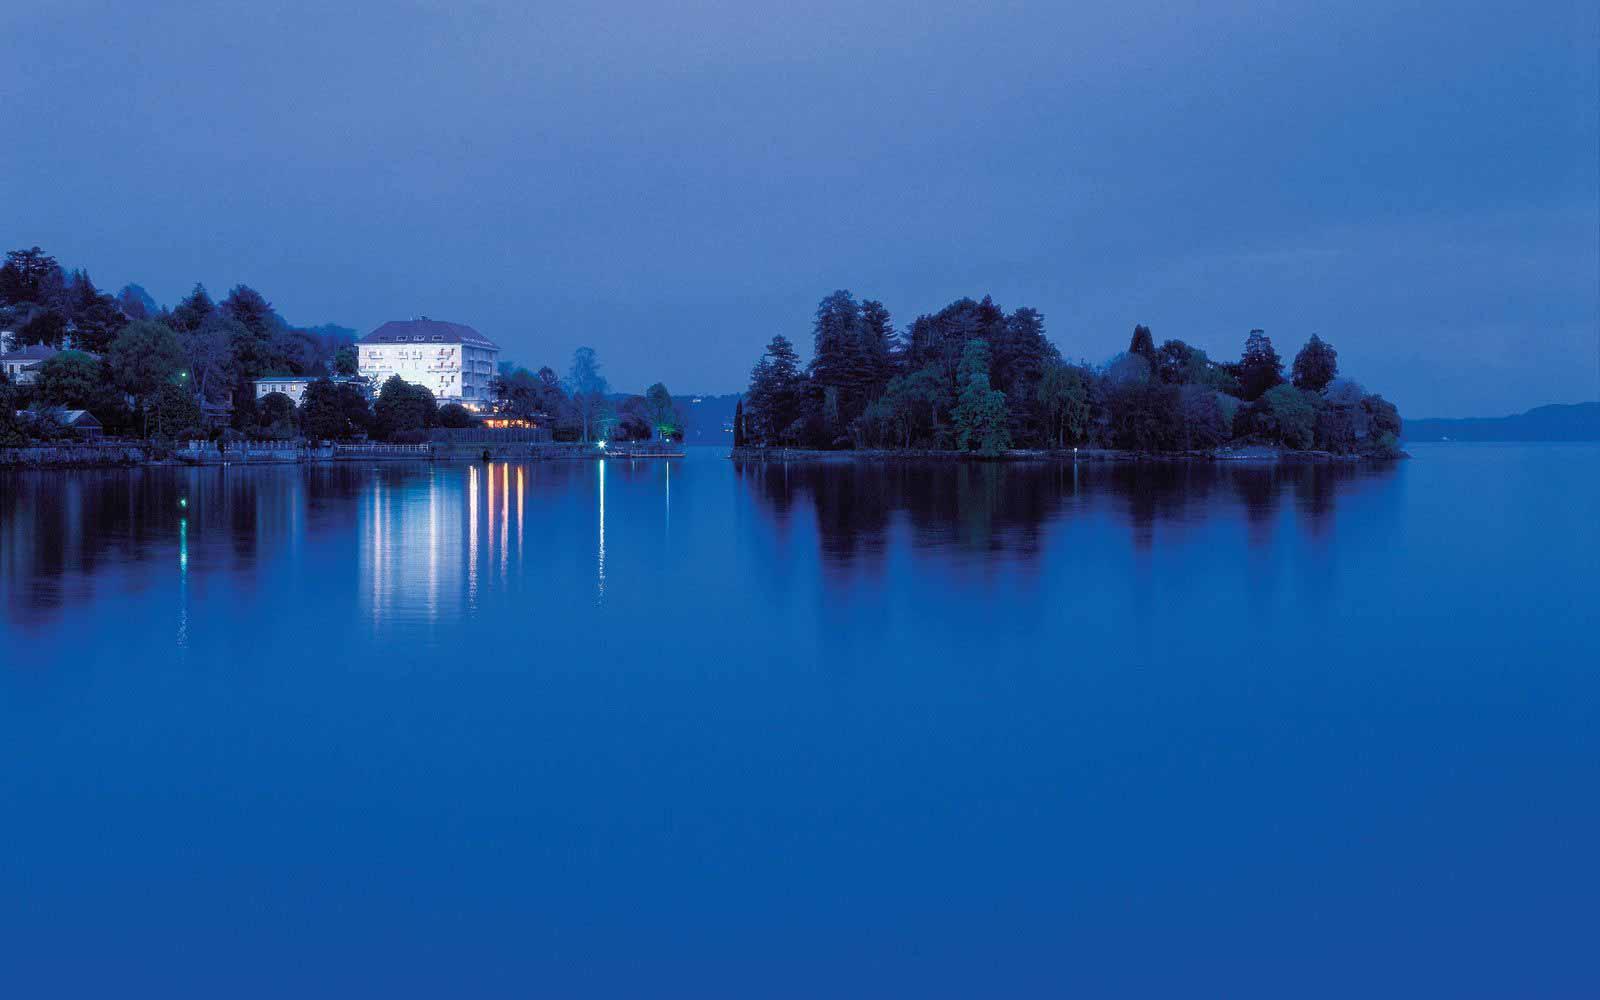 Grand Hotel Majestic seen from Lake Maggiore at night